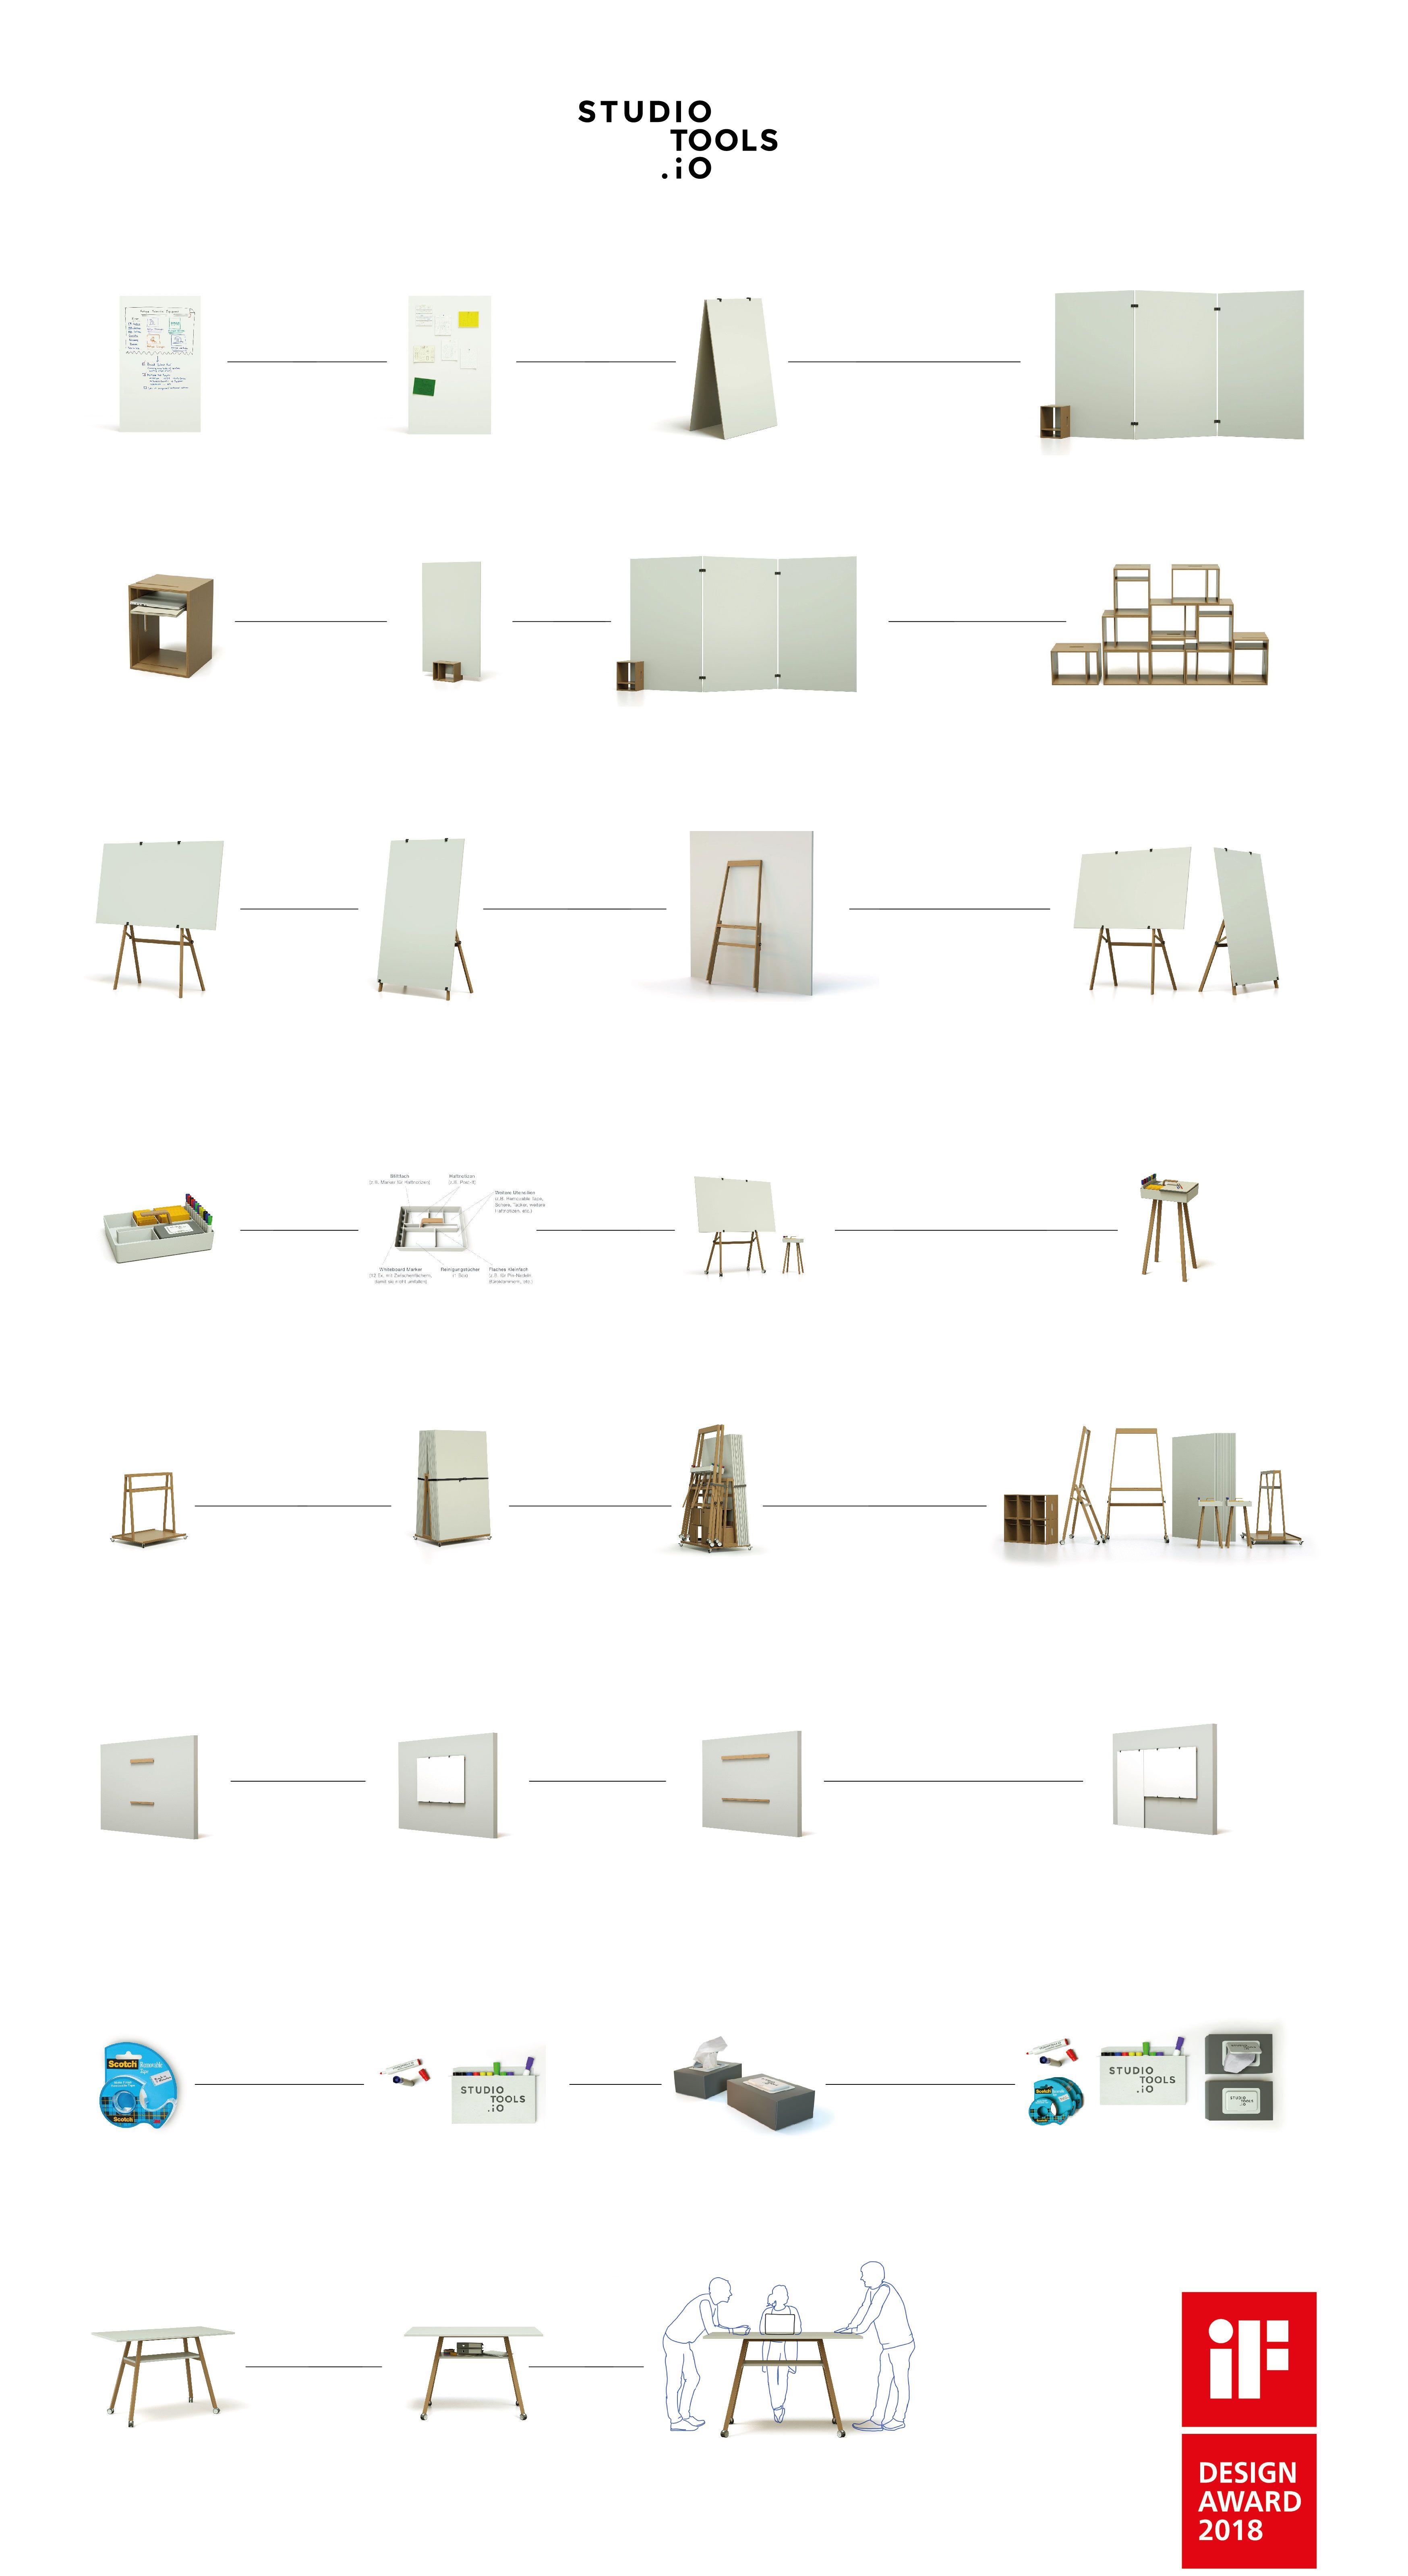 Studiotools Simply The Most Flexible Workshop An Whiteboard Design Tool Studio Arbeitsplatz Wolle Kaufen